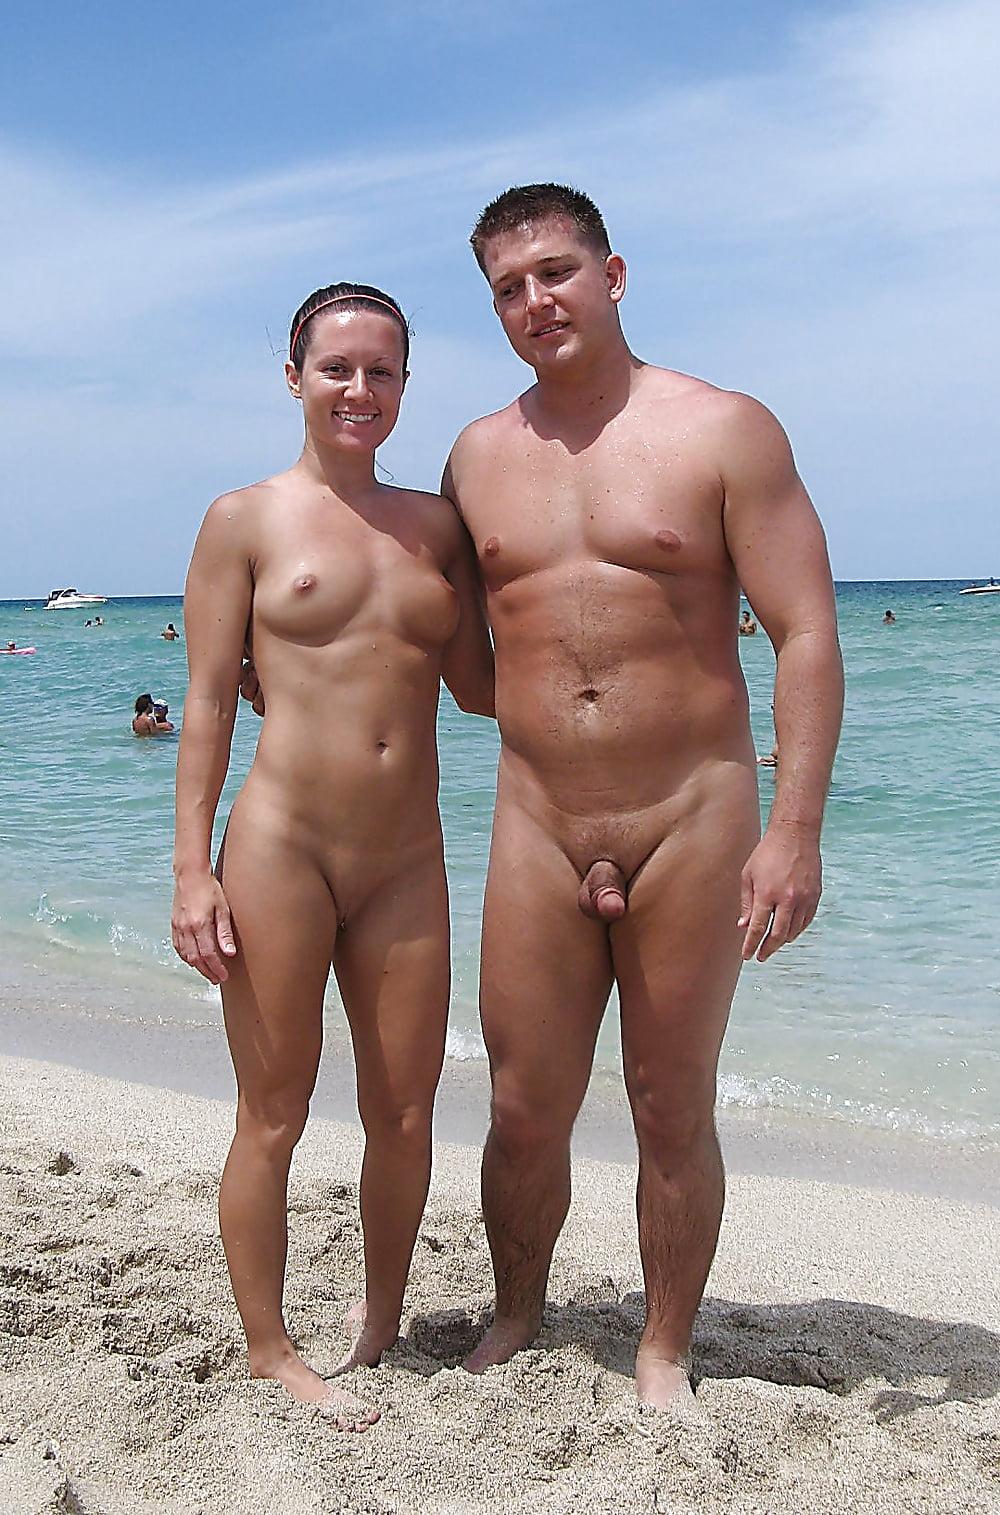 Galleries of couples nude, karina white atk galleria